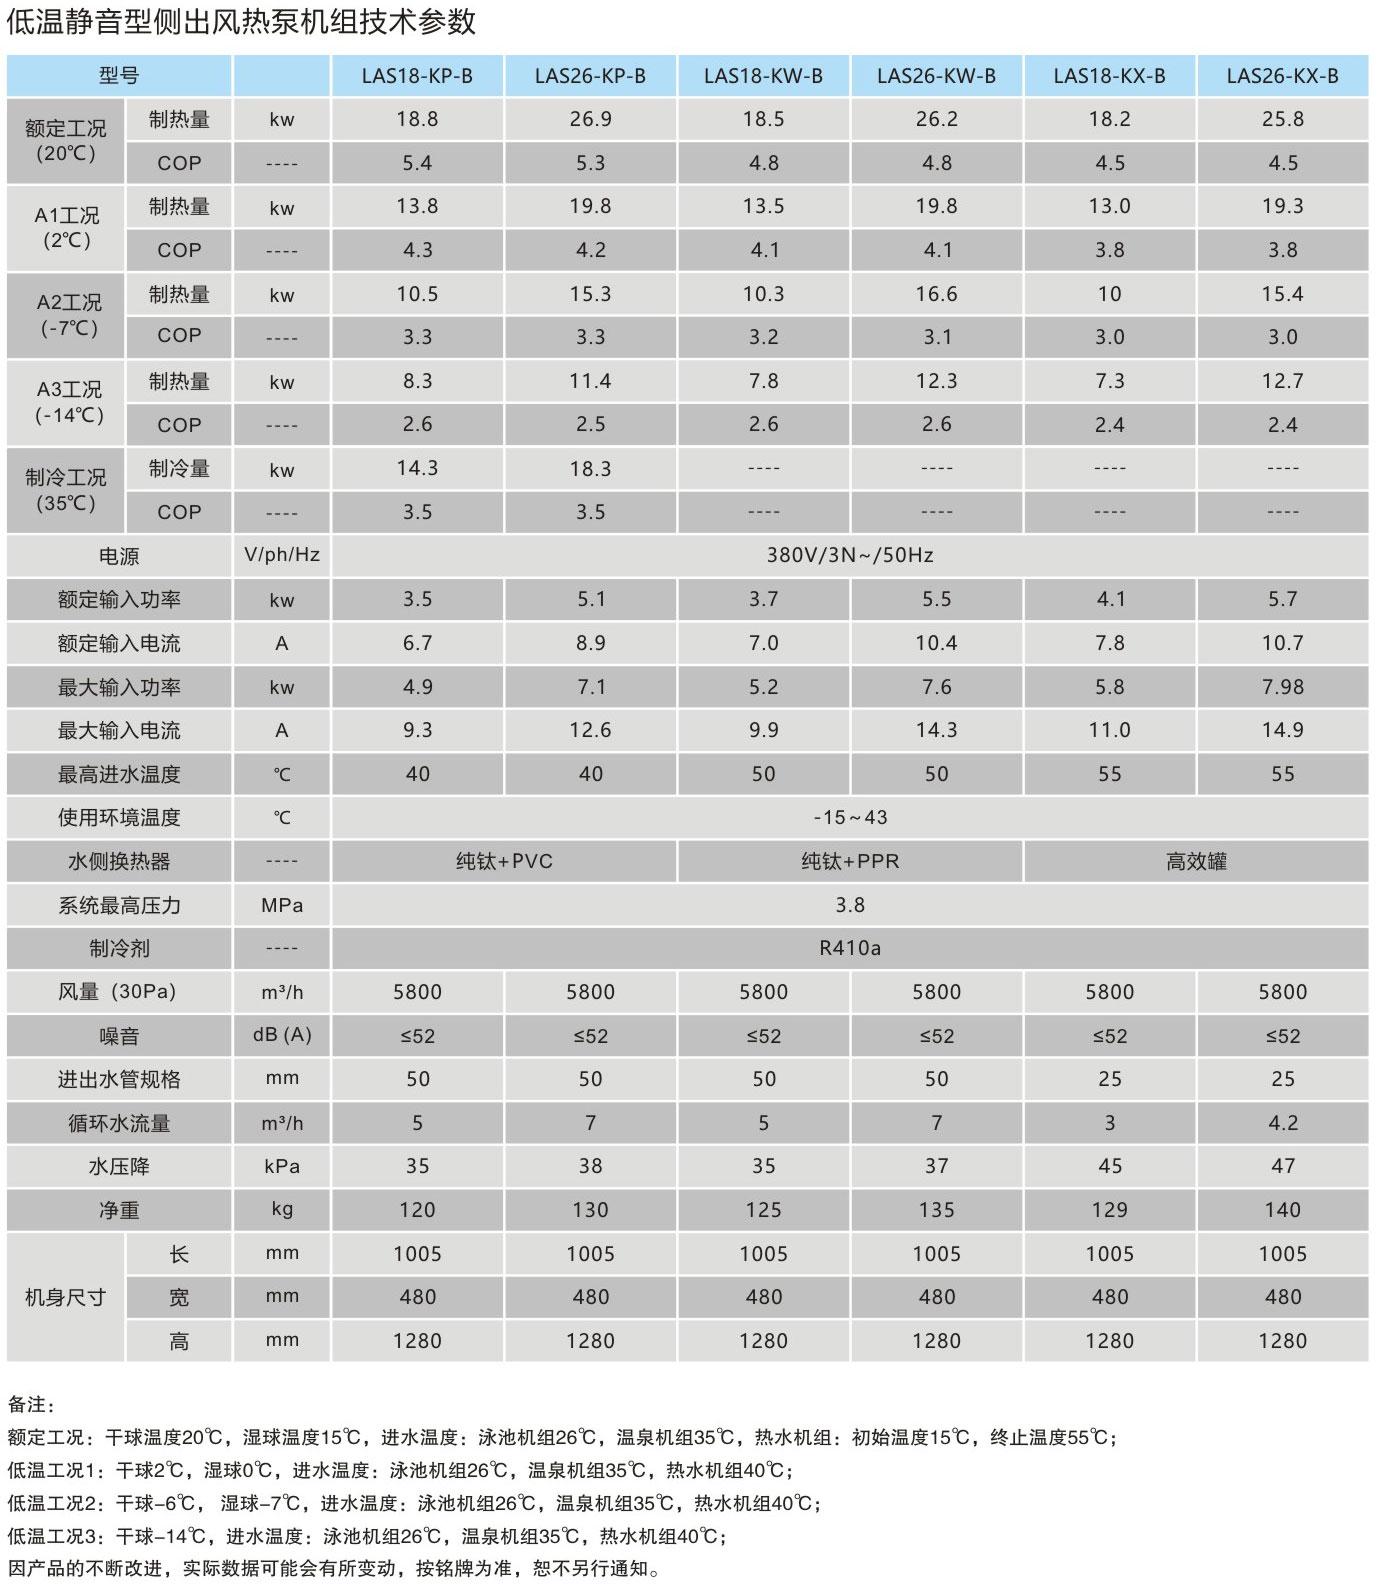 04(B2)空气源热泵系列中文-5_03.jpg